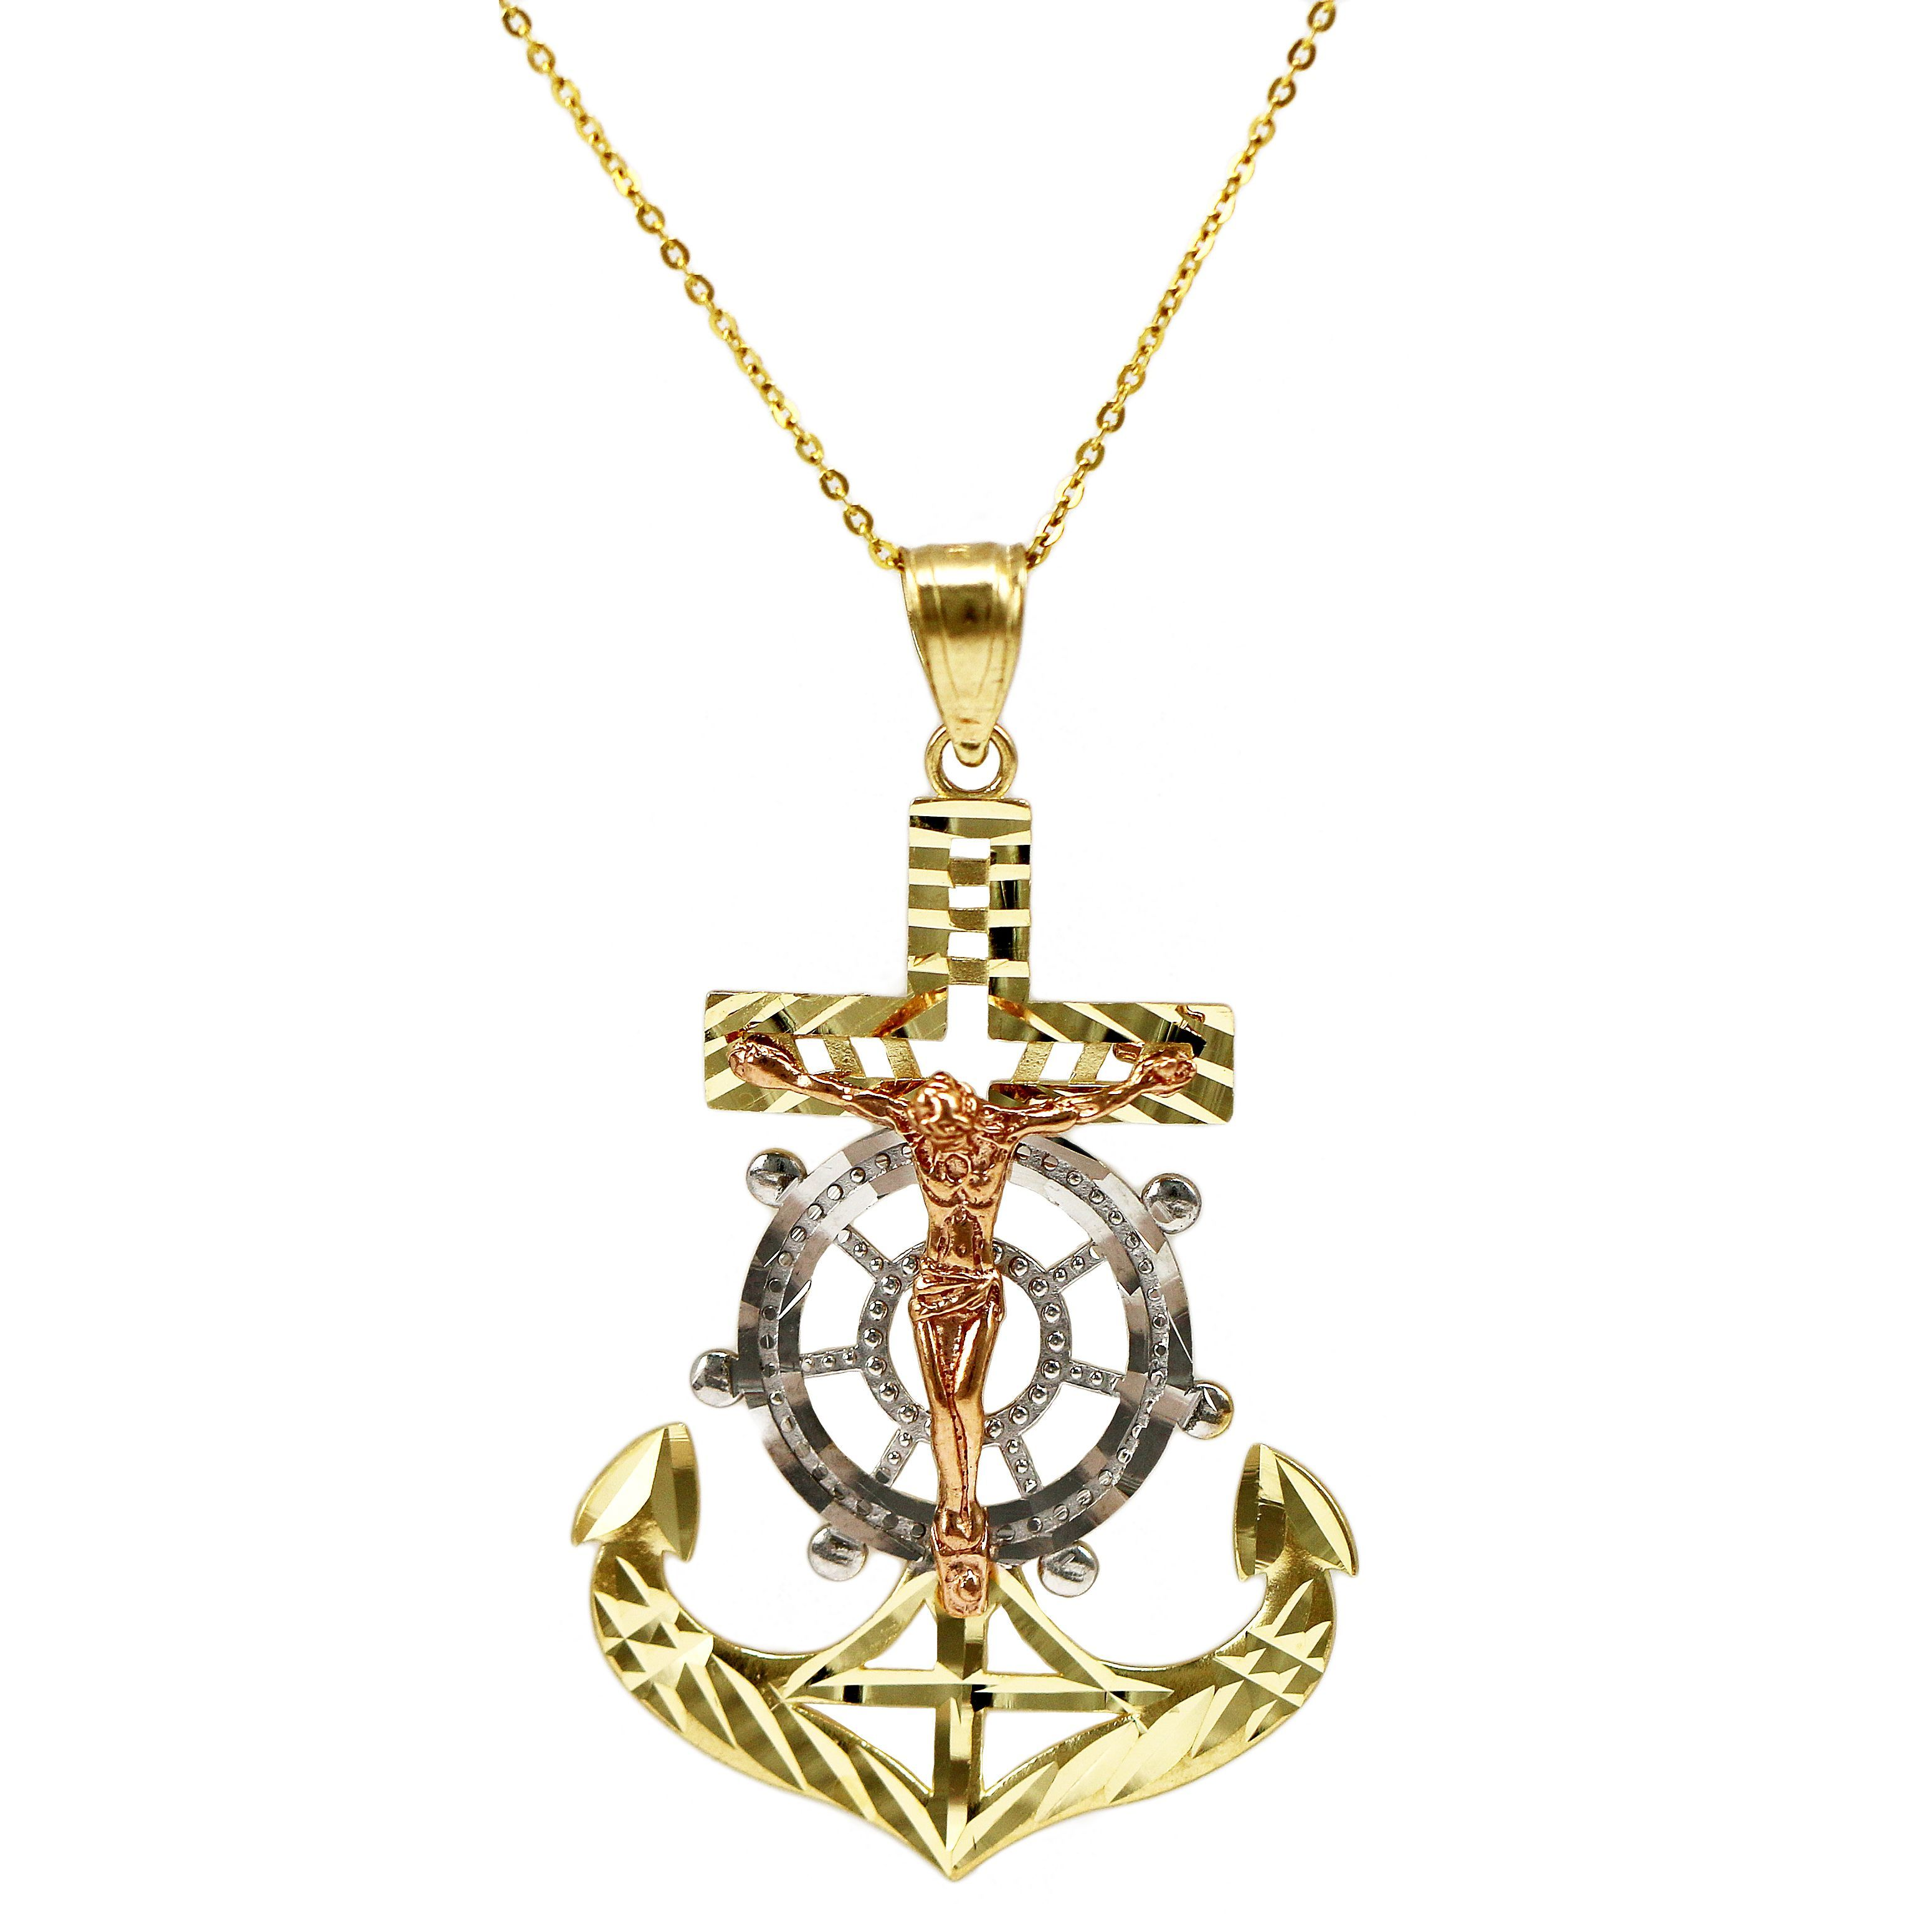 14k Tricolor Gold Nautical Jesus Necklace 20 inch mariner link